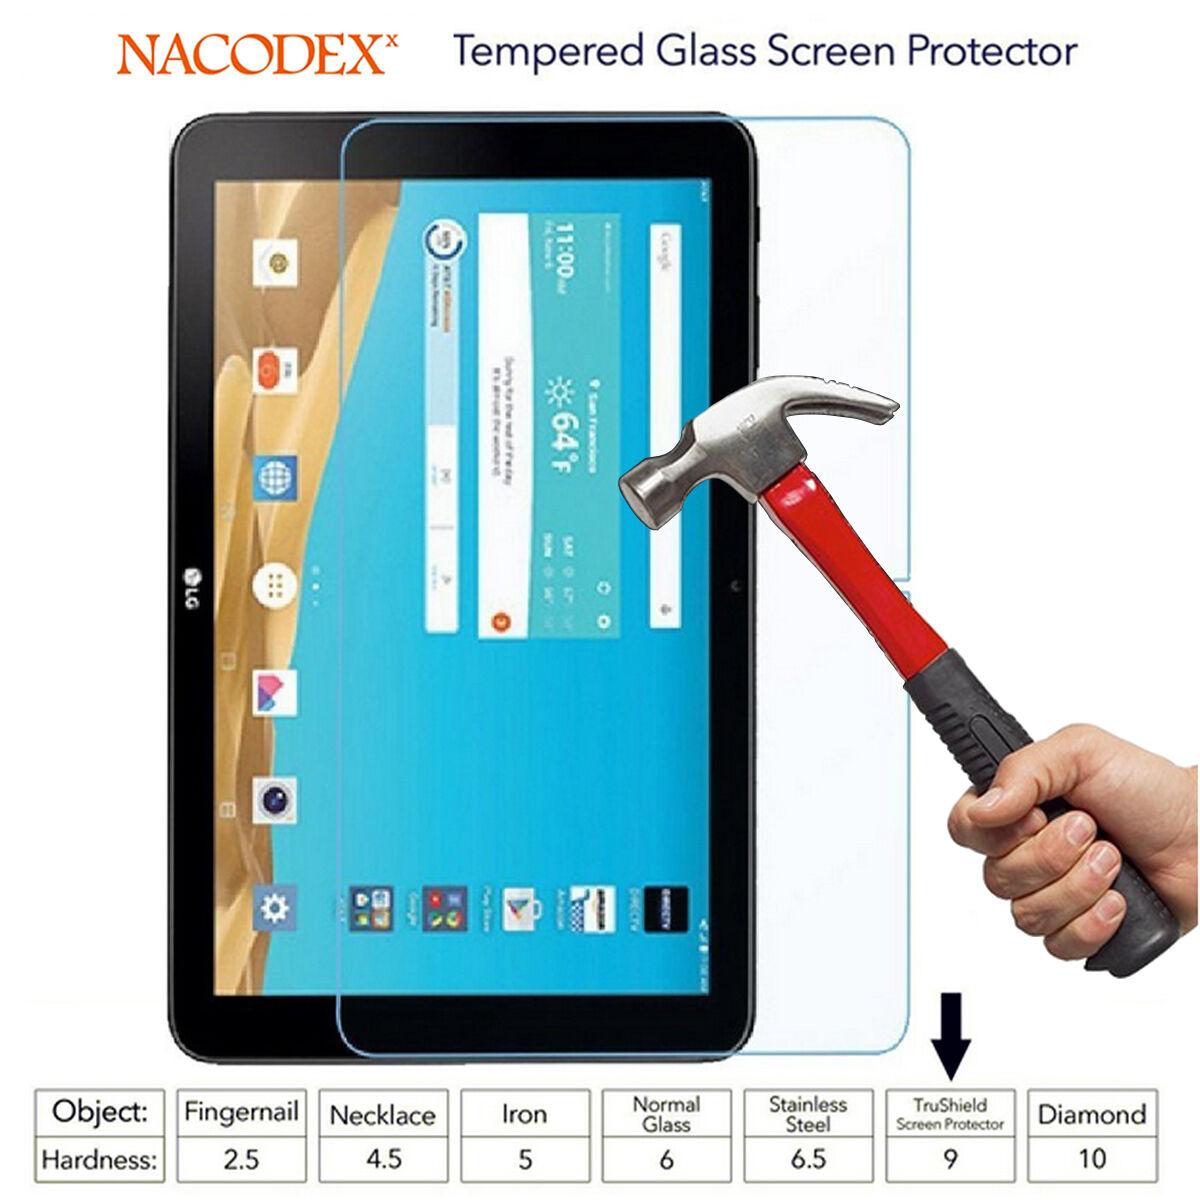 Nacodex For LG G Pad II 10.1 V940 HD Premium Tempered Glass Screen Protector